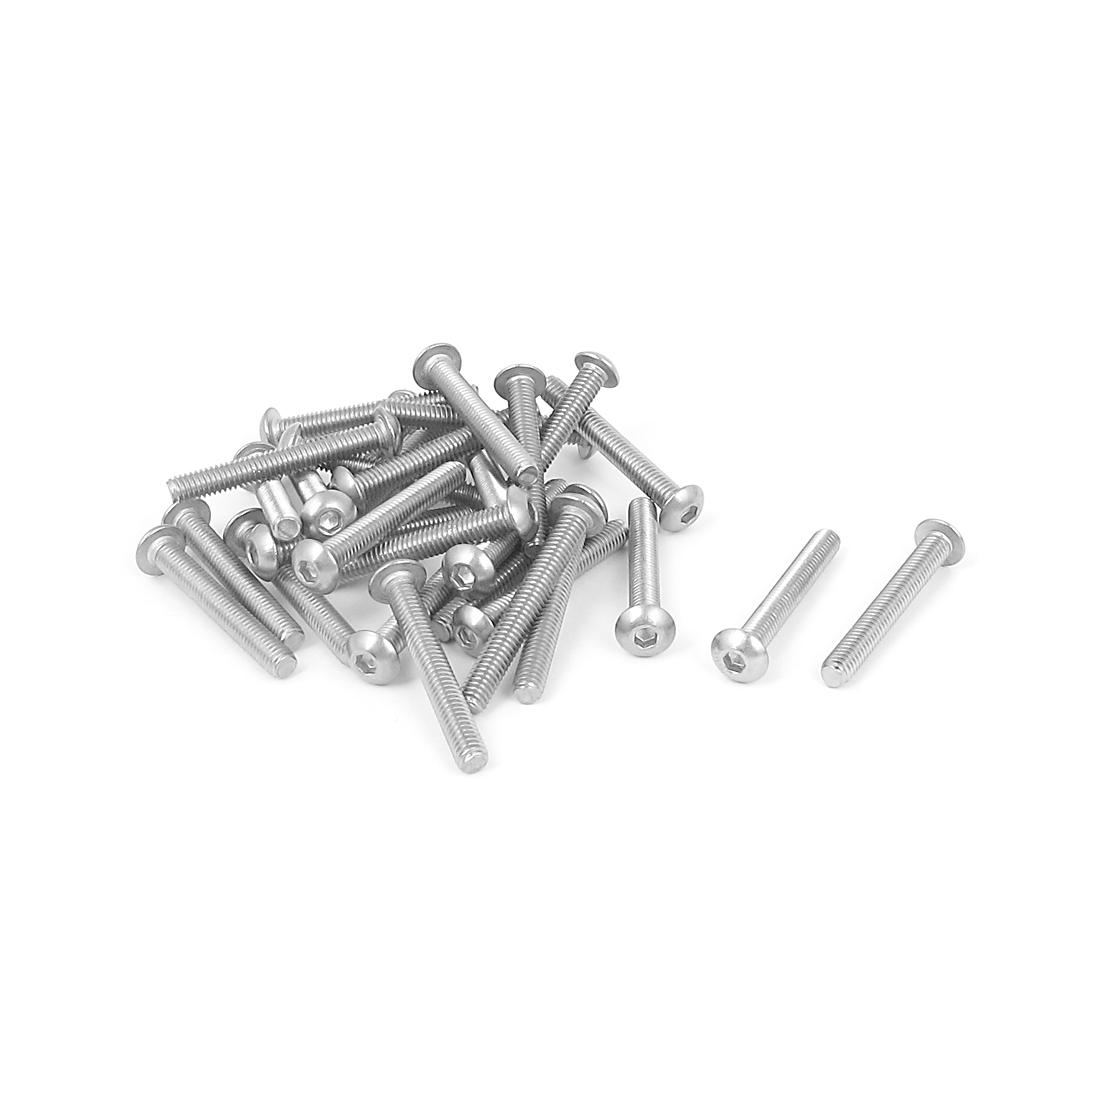 M4x30mm 304 Stainless Steel Hex Socket Machine Countersunk Round Head Screw Bolts 30PCS